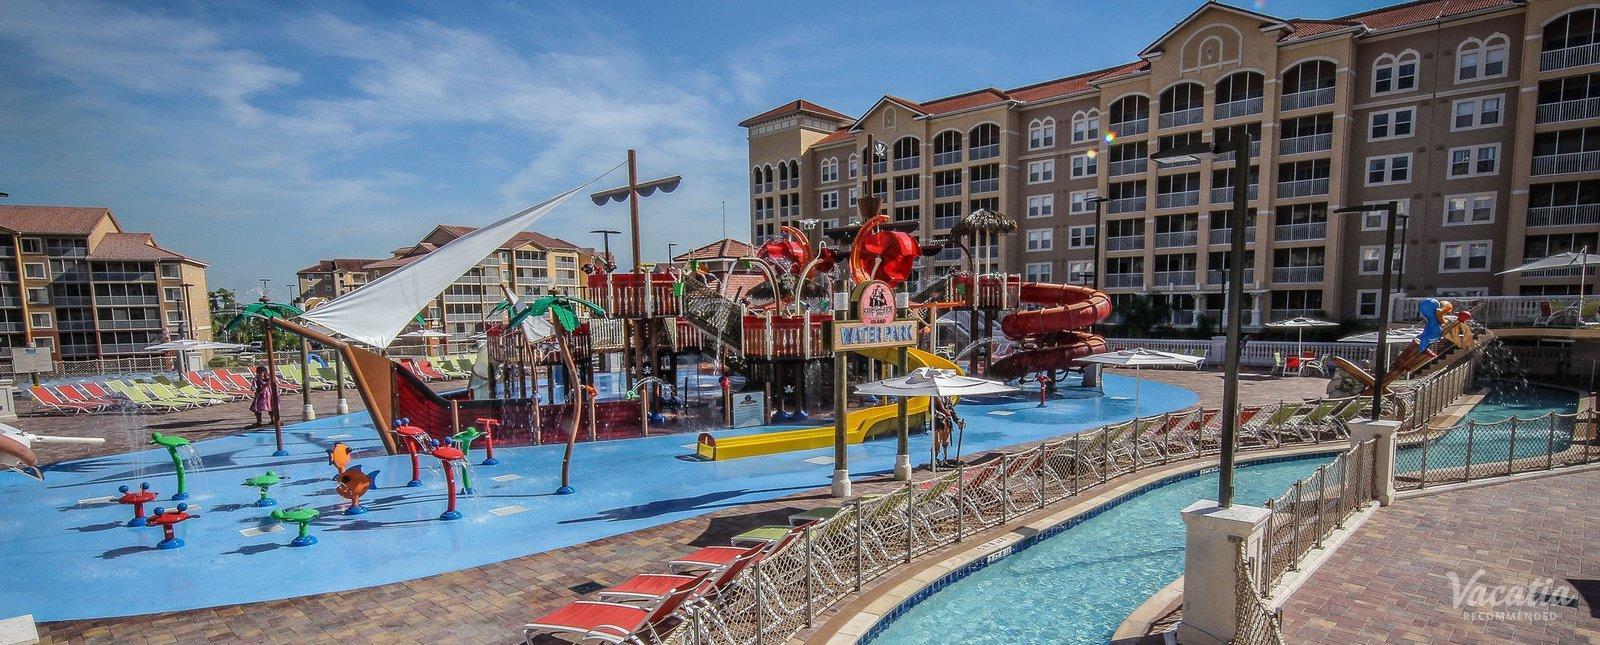 Westgate Town Center Resort: Reviews, Pictures & Floor